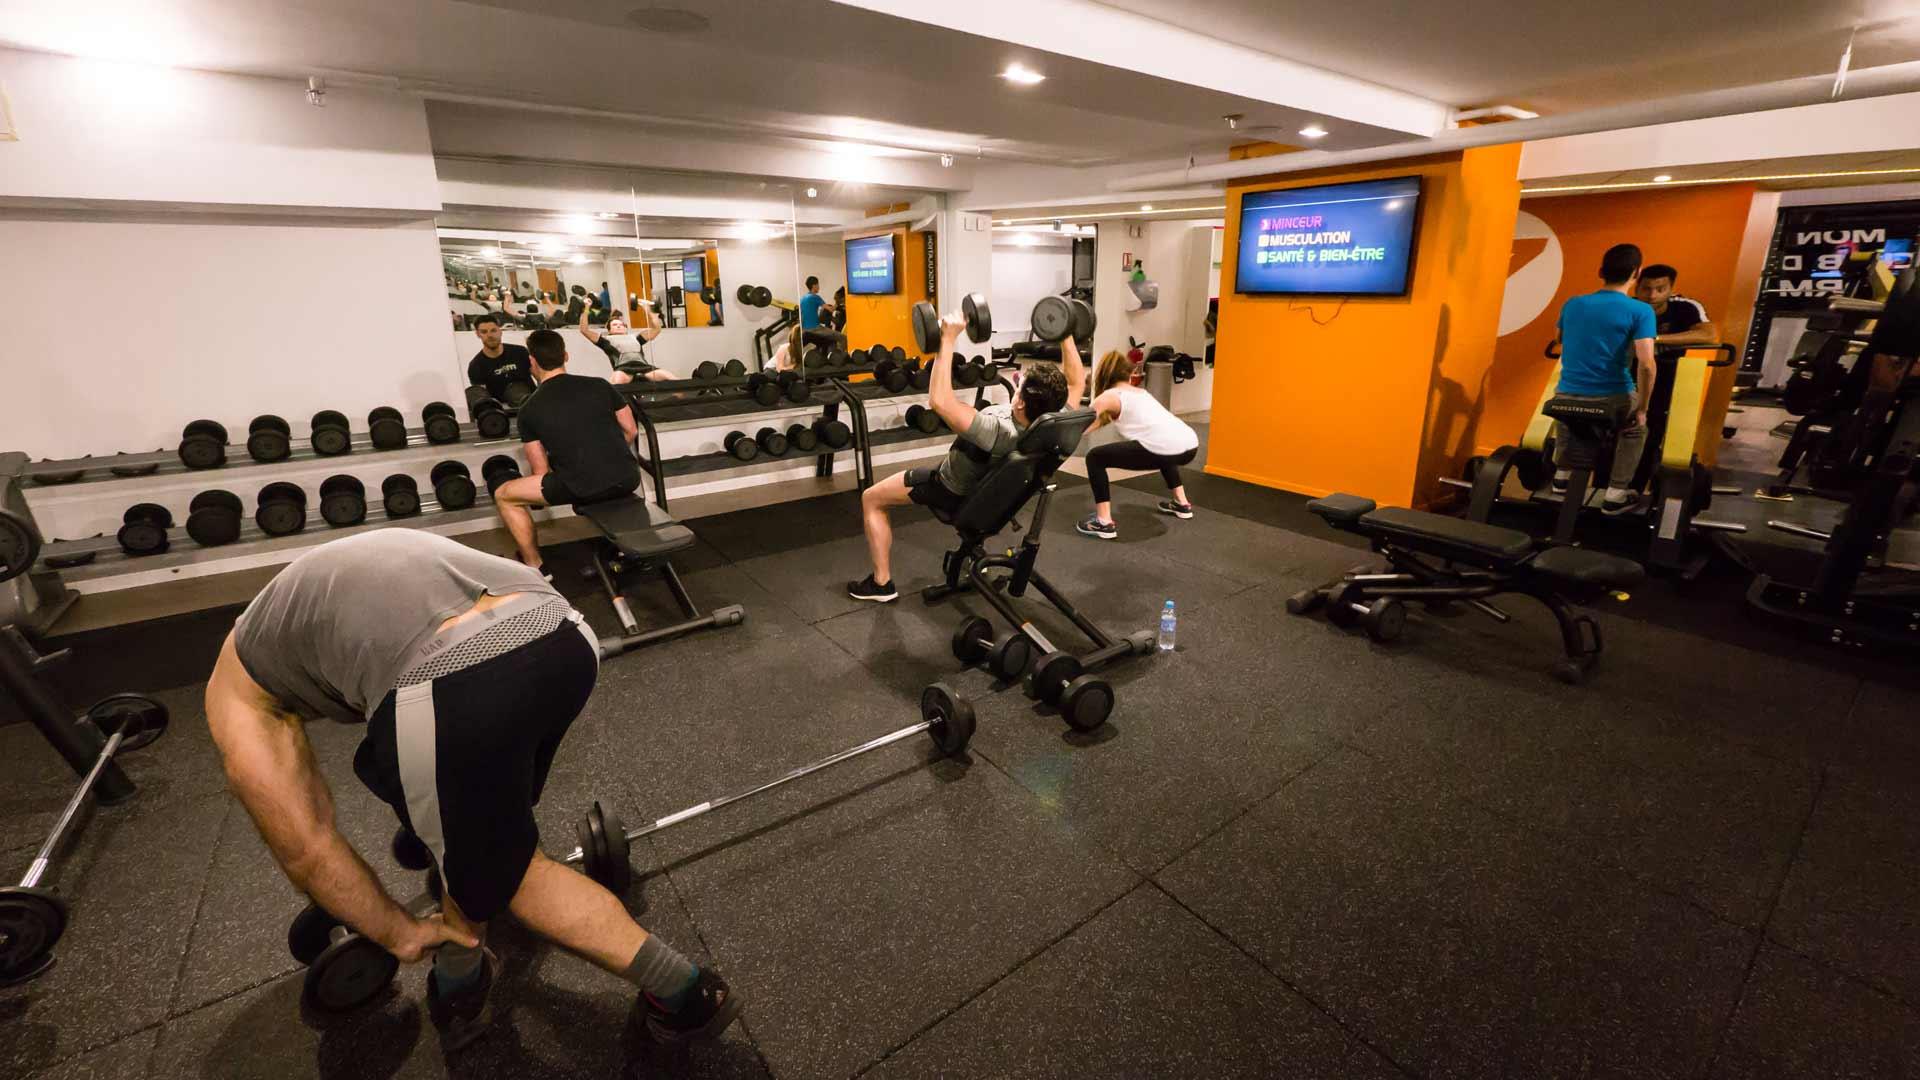 Salle De Sport Lattes Fitness Musculation Cardio Club De Forme